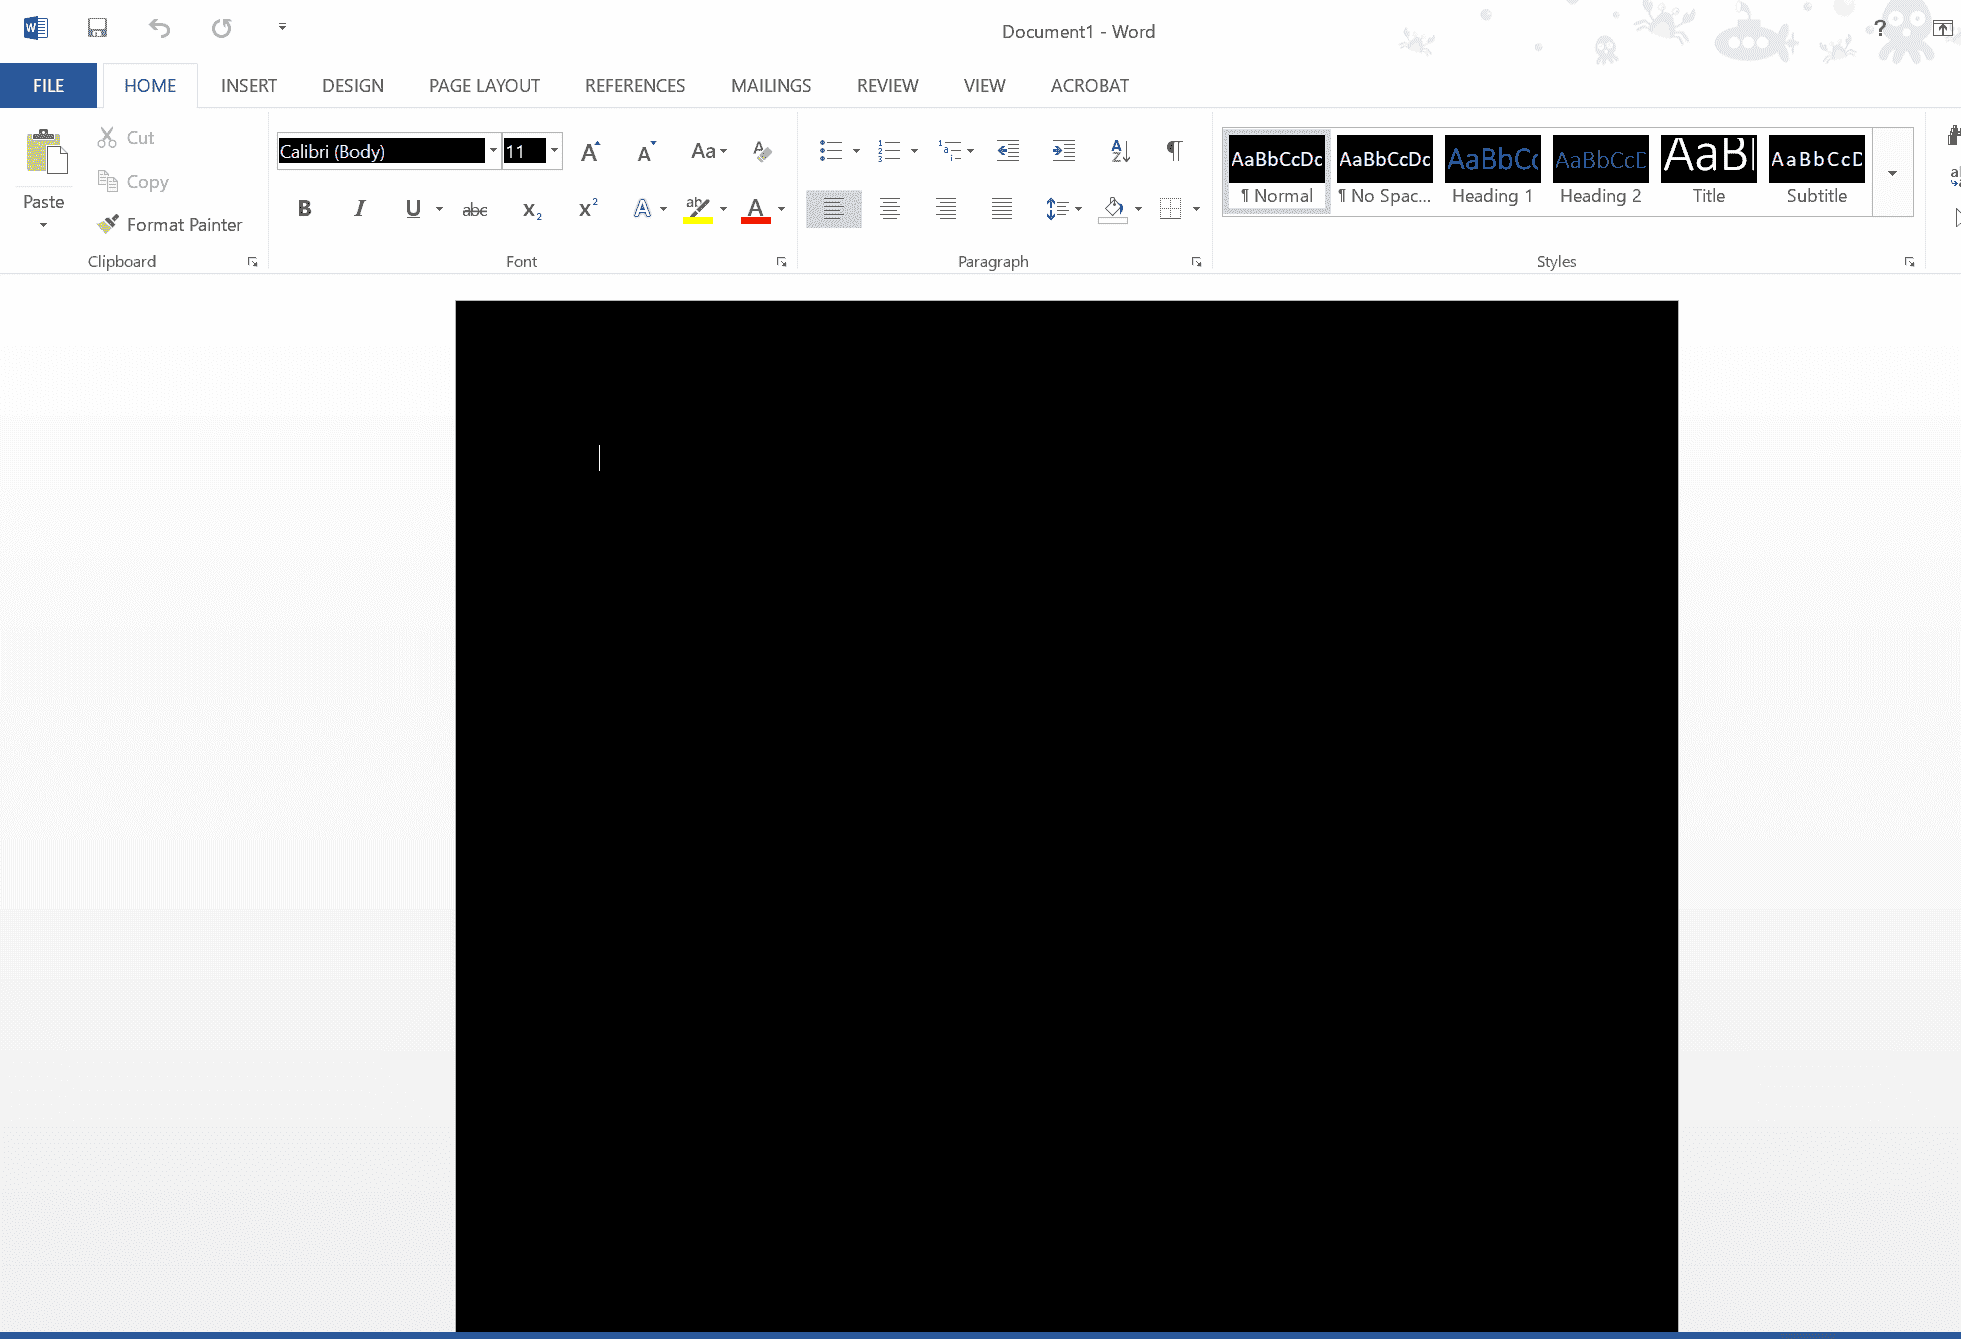 Parts of the screen inverted/black 8abb0013-00f9-41d4-9131-796feb5f8470?upload=true.png